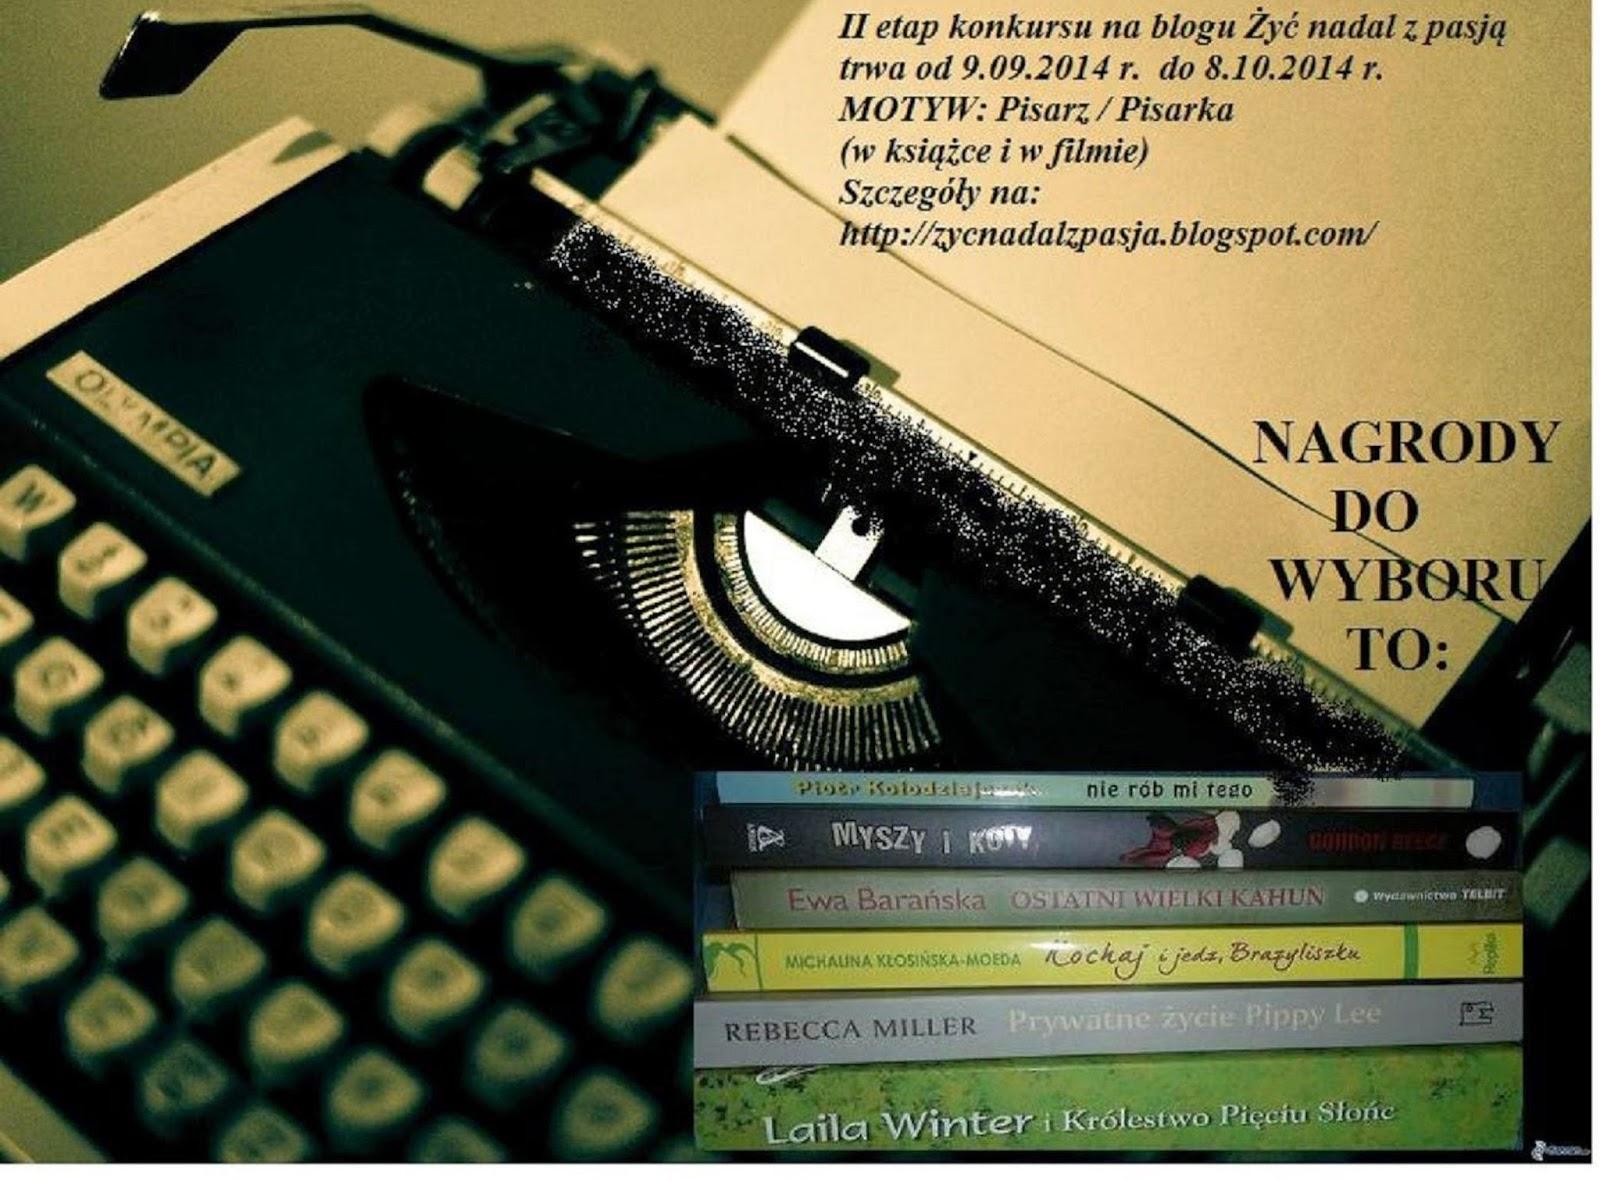 http://zycnadalzpasja.blogspot.com/2014/09/ii-etap-konkursu-porocznego.html